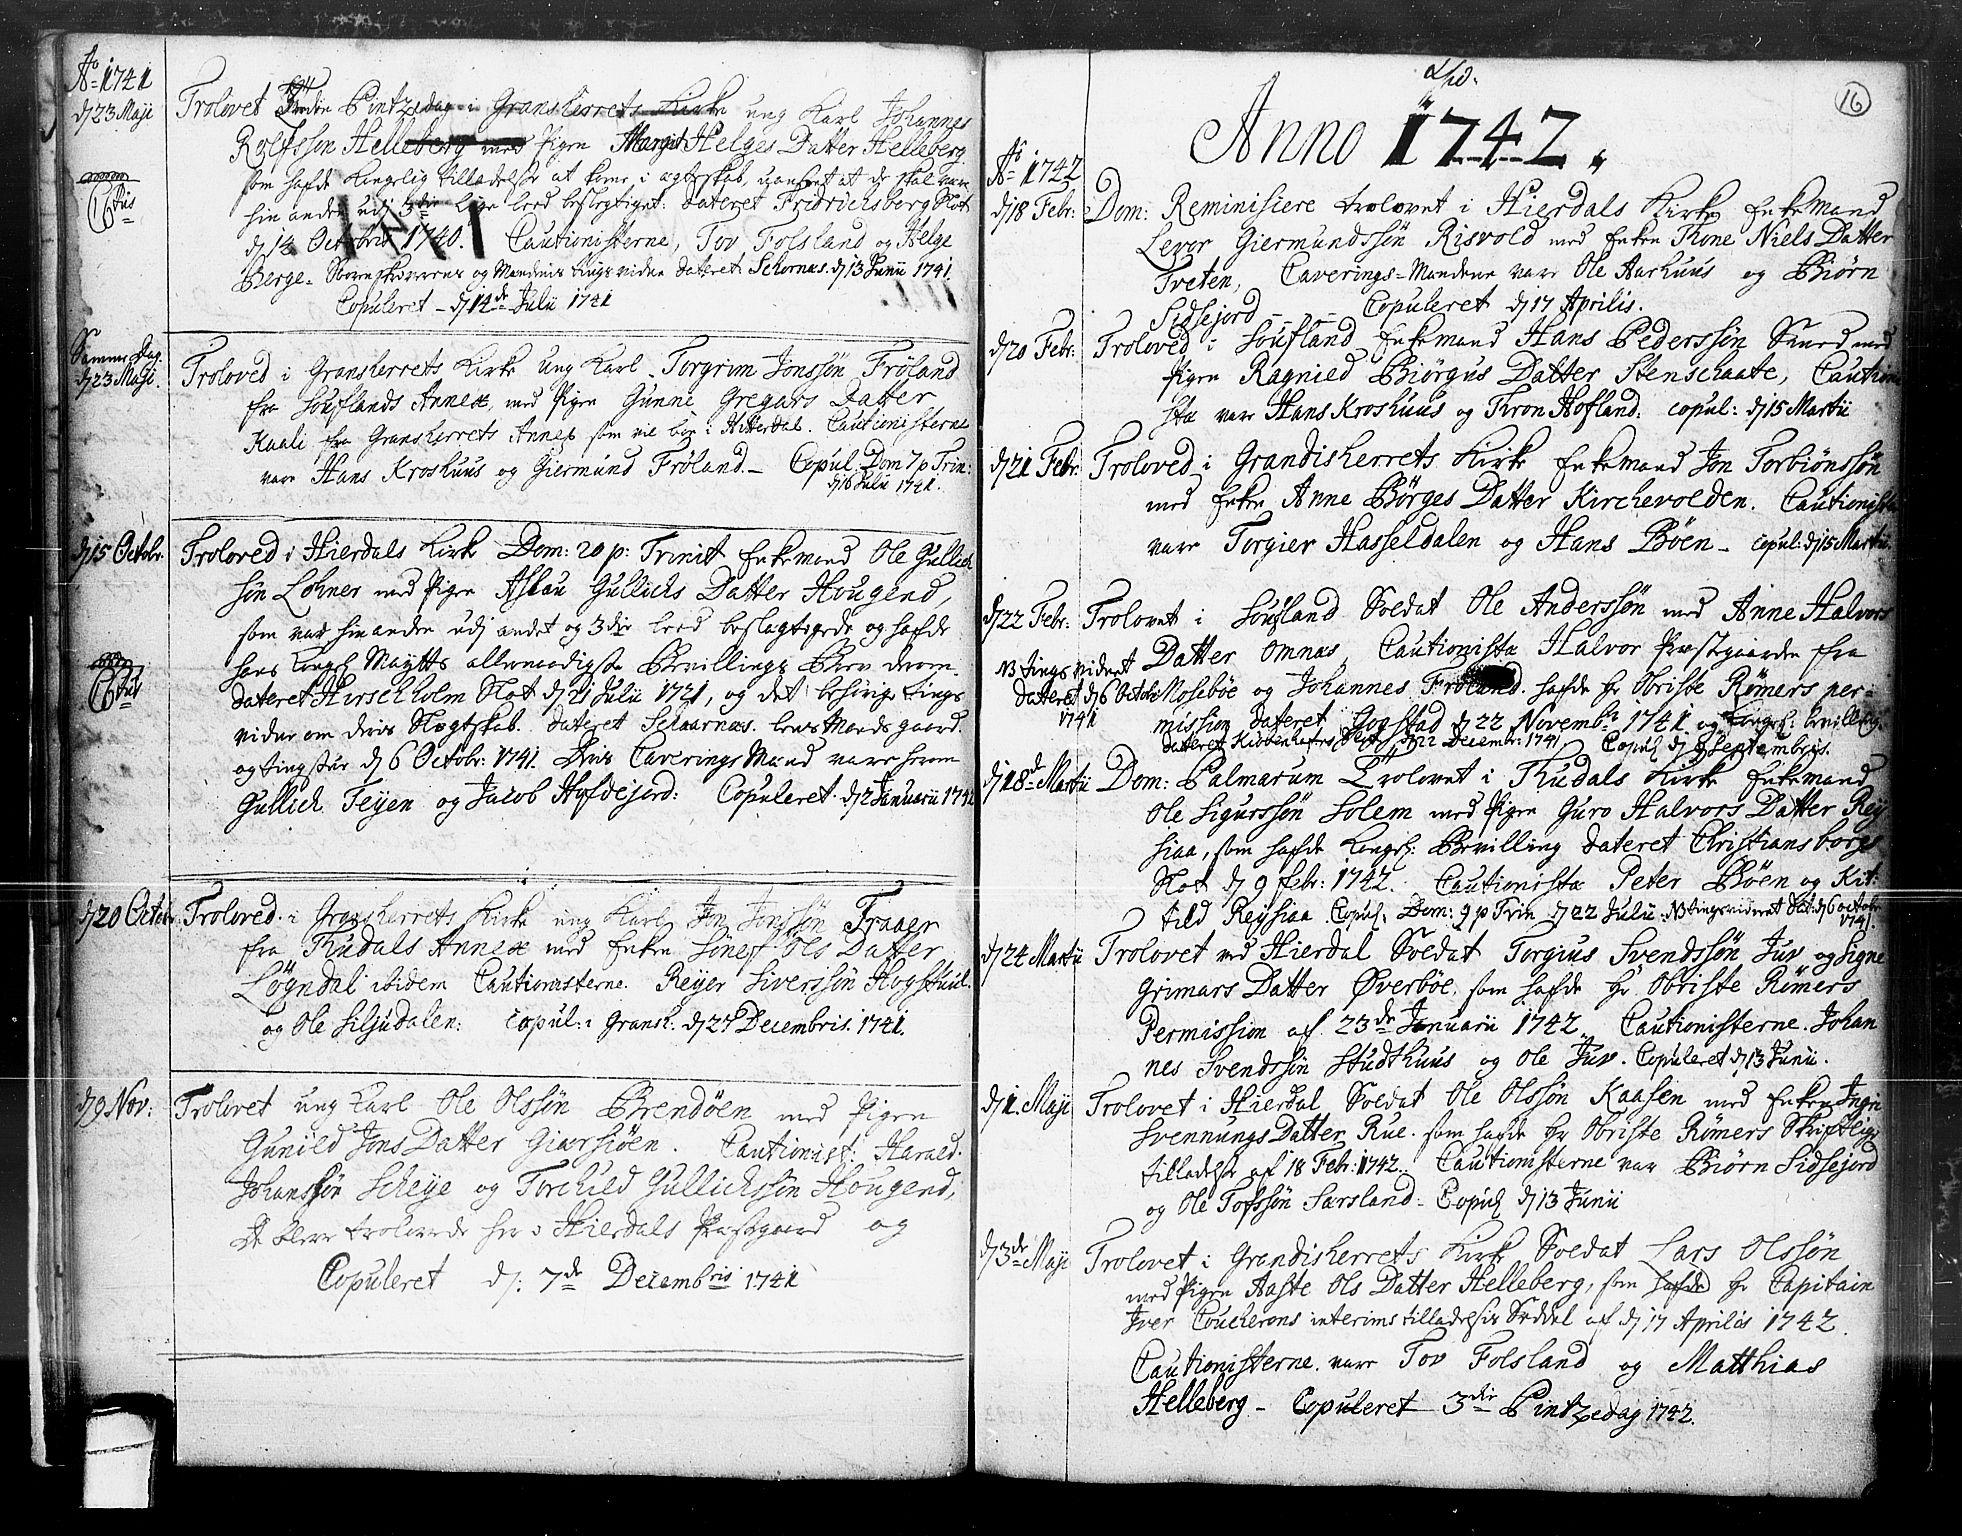 SAKO, Hjartdal kirkebøker, F/Fa/L0004: Ministerialbok nr. I 4, 1727-1795, s. 16